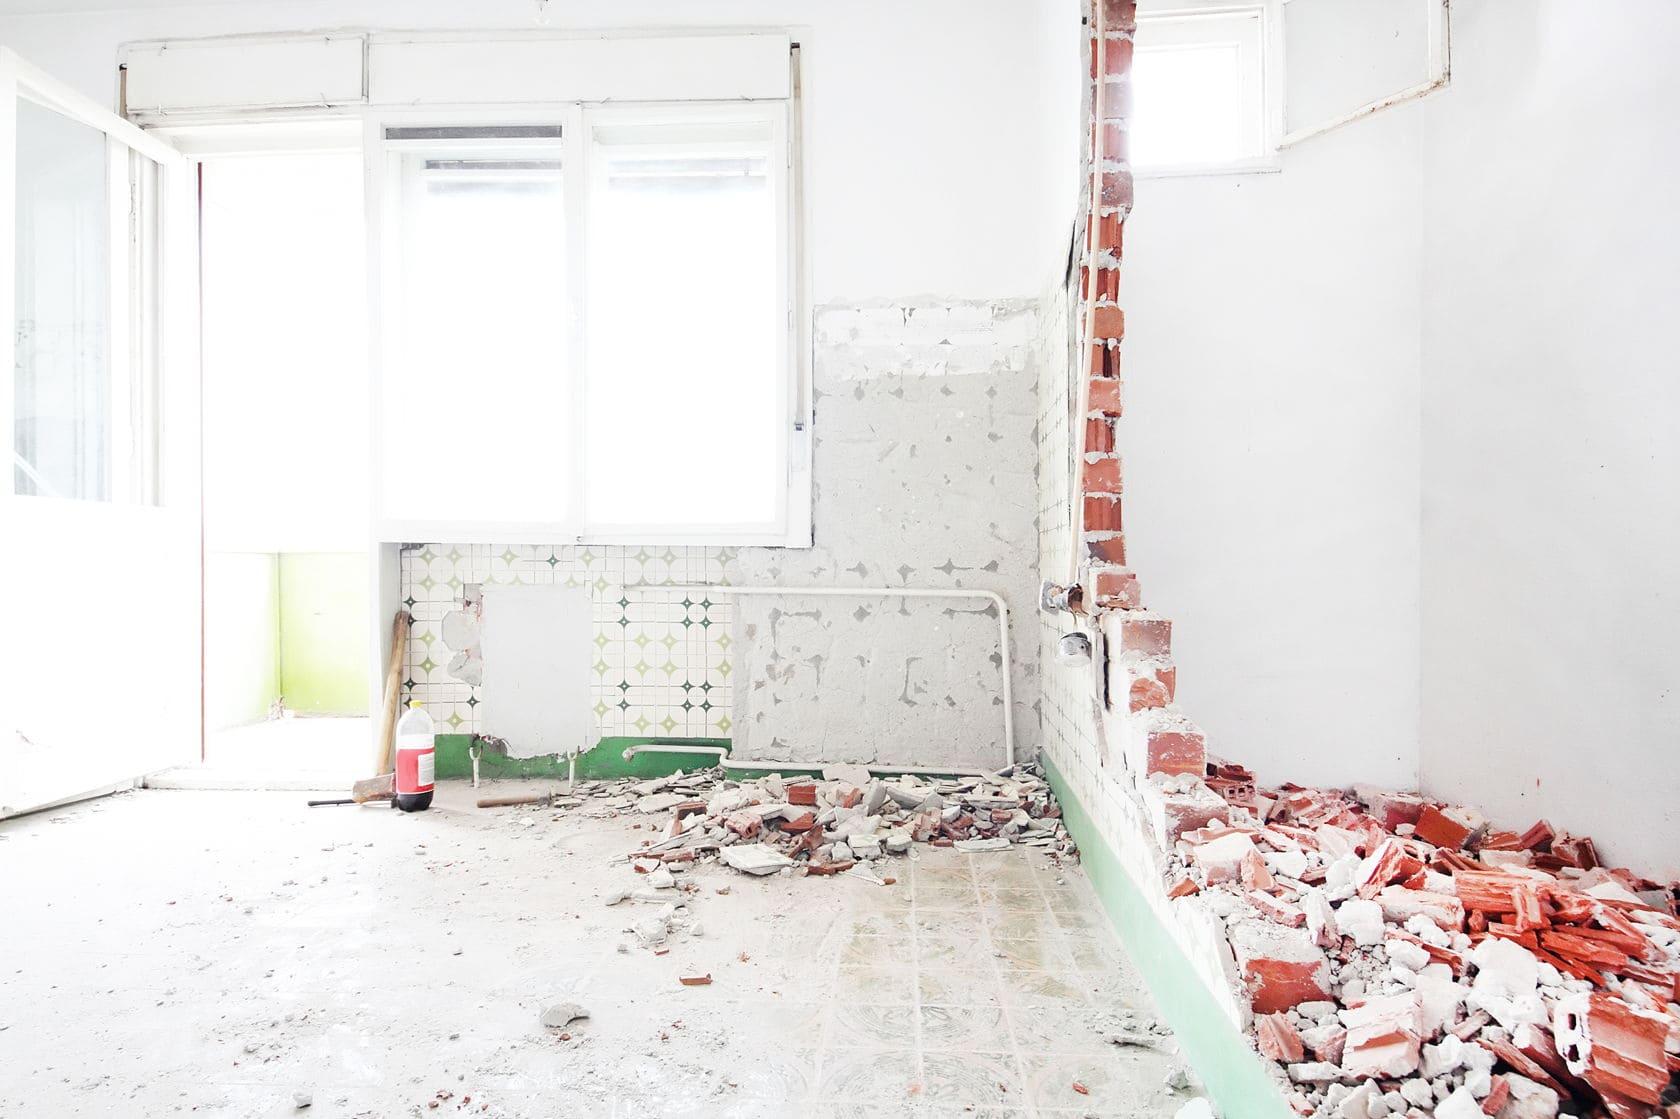 демонтируем внутри квартир